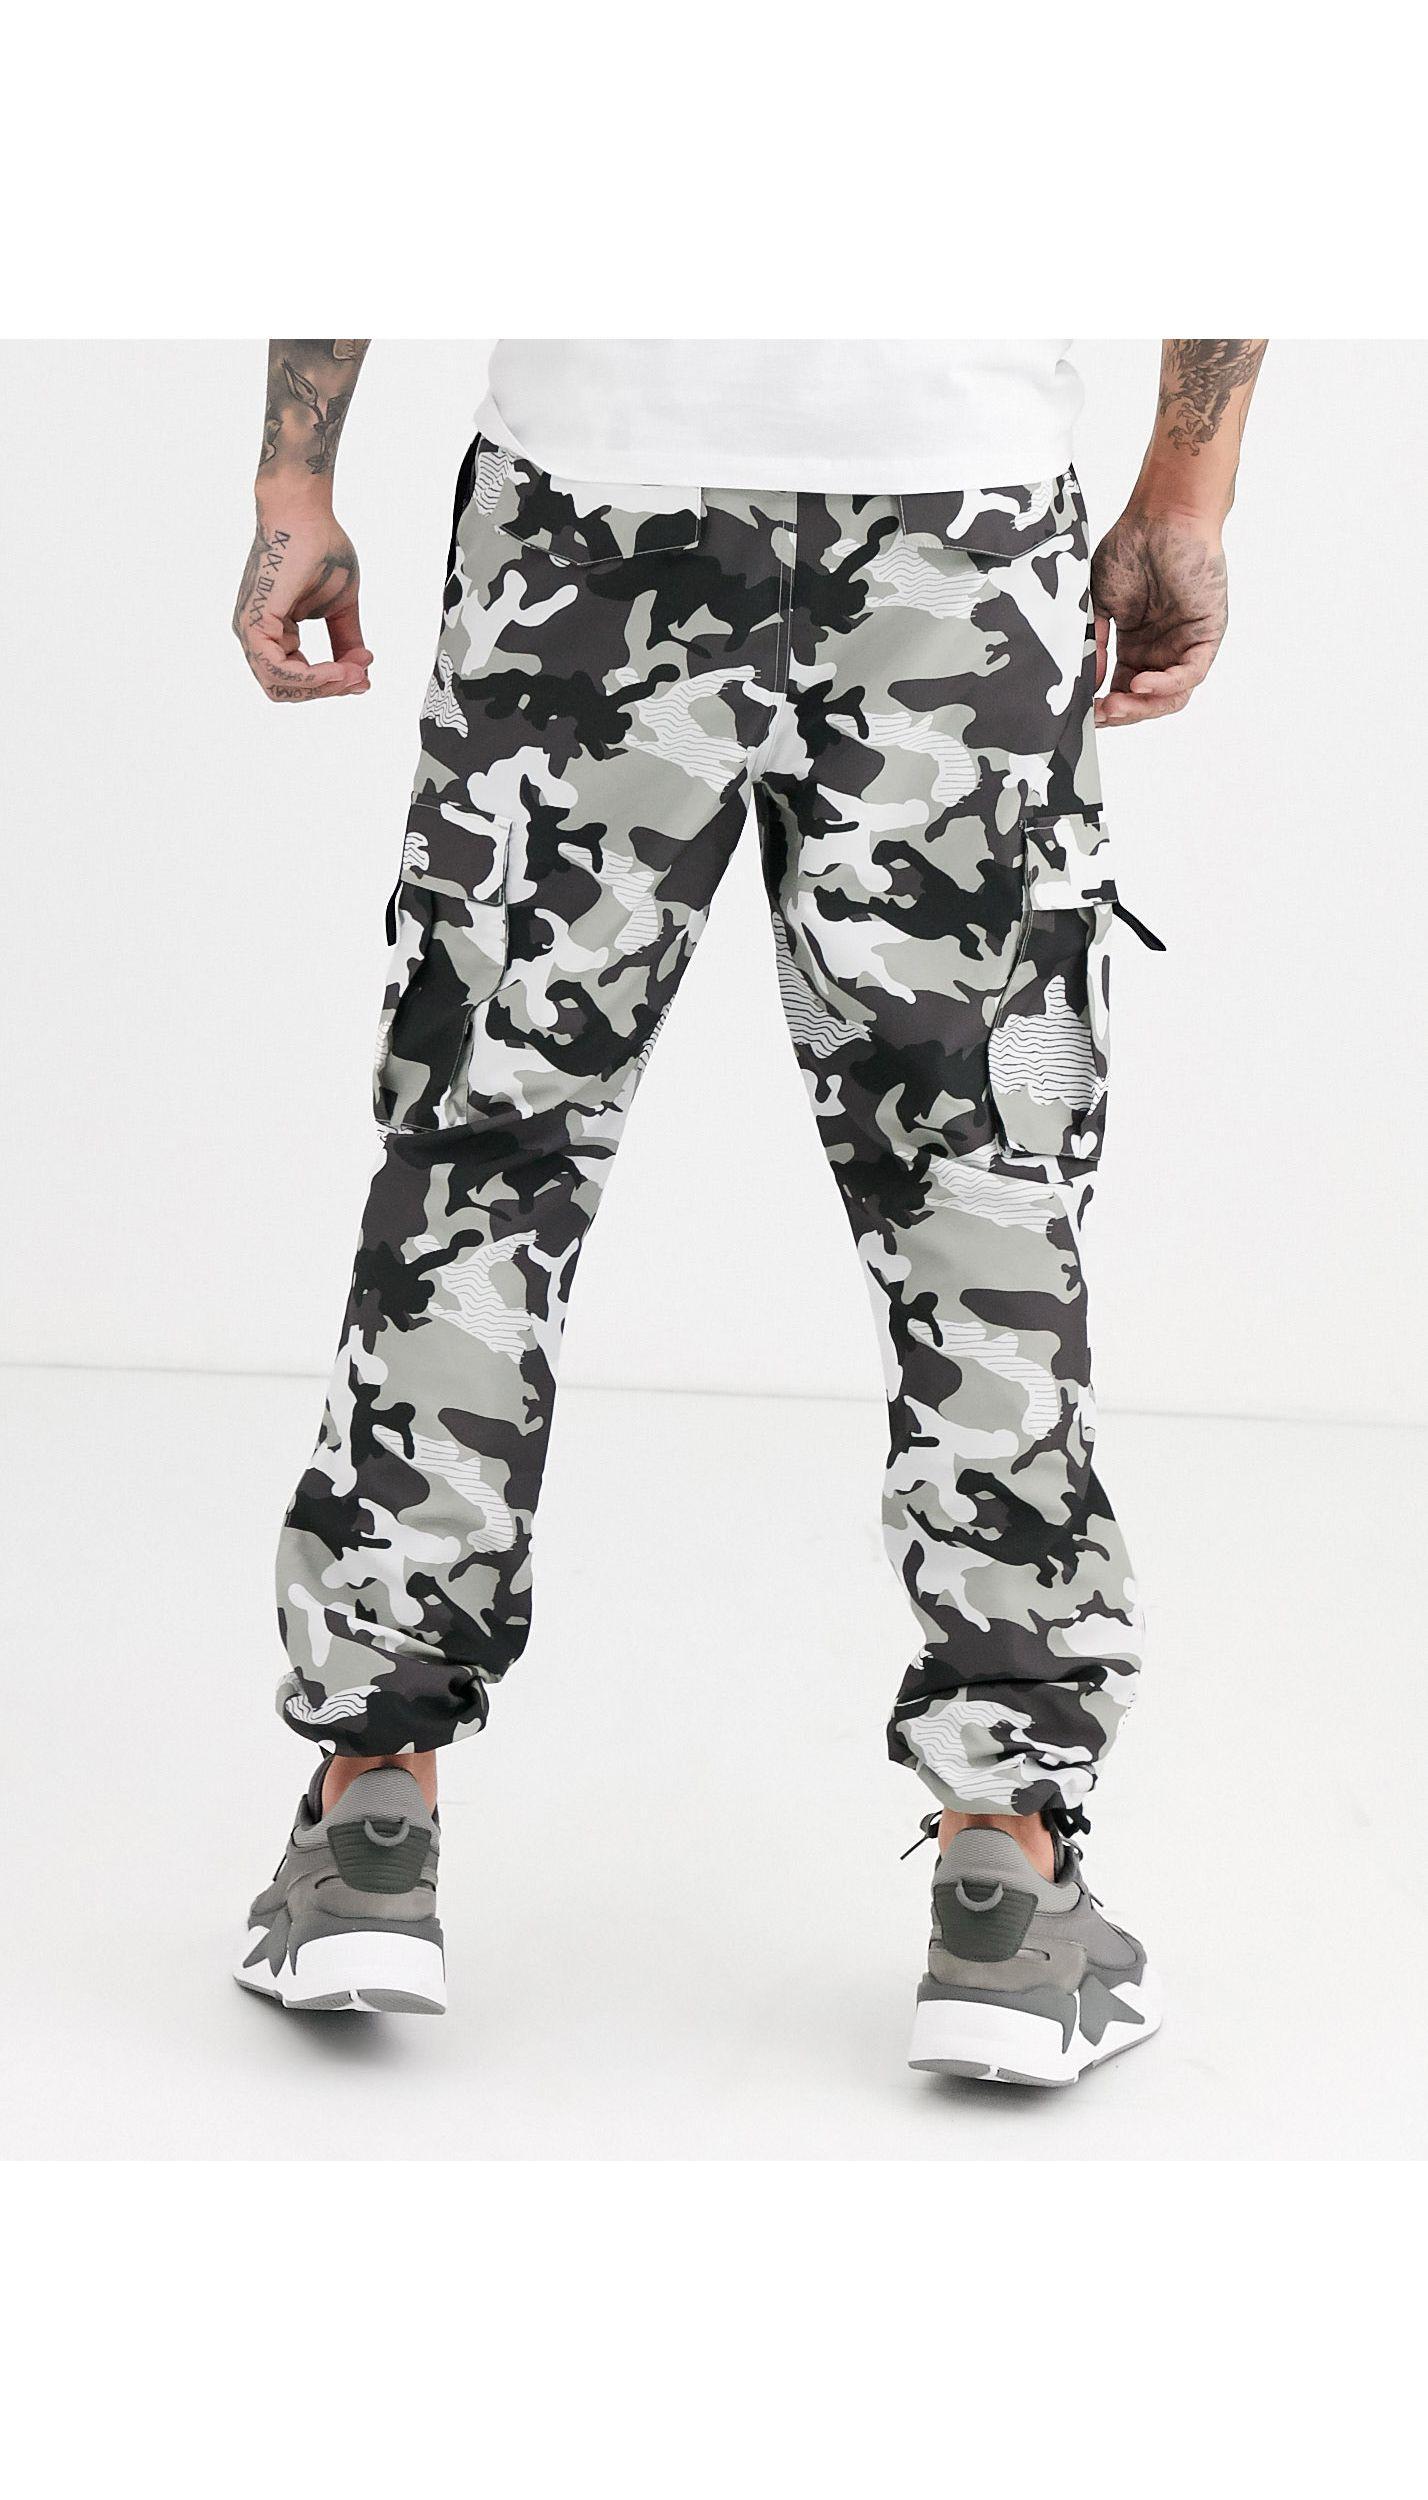 PUMA Cotton Xtg Trail Camo Cargo Pants in Black for Men - Lyst